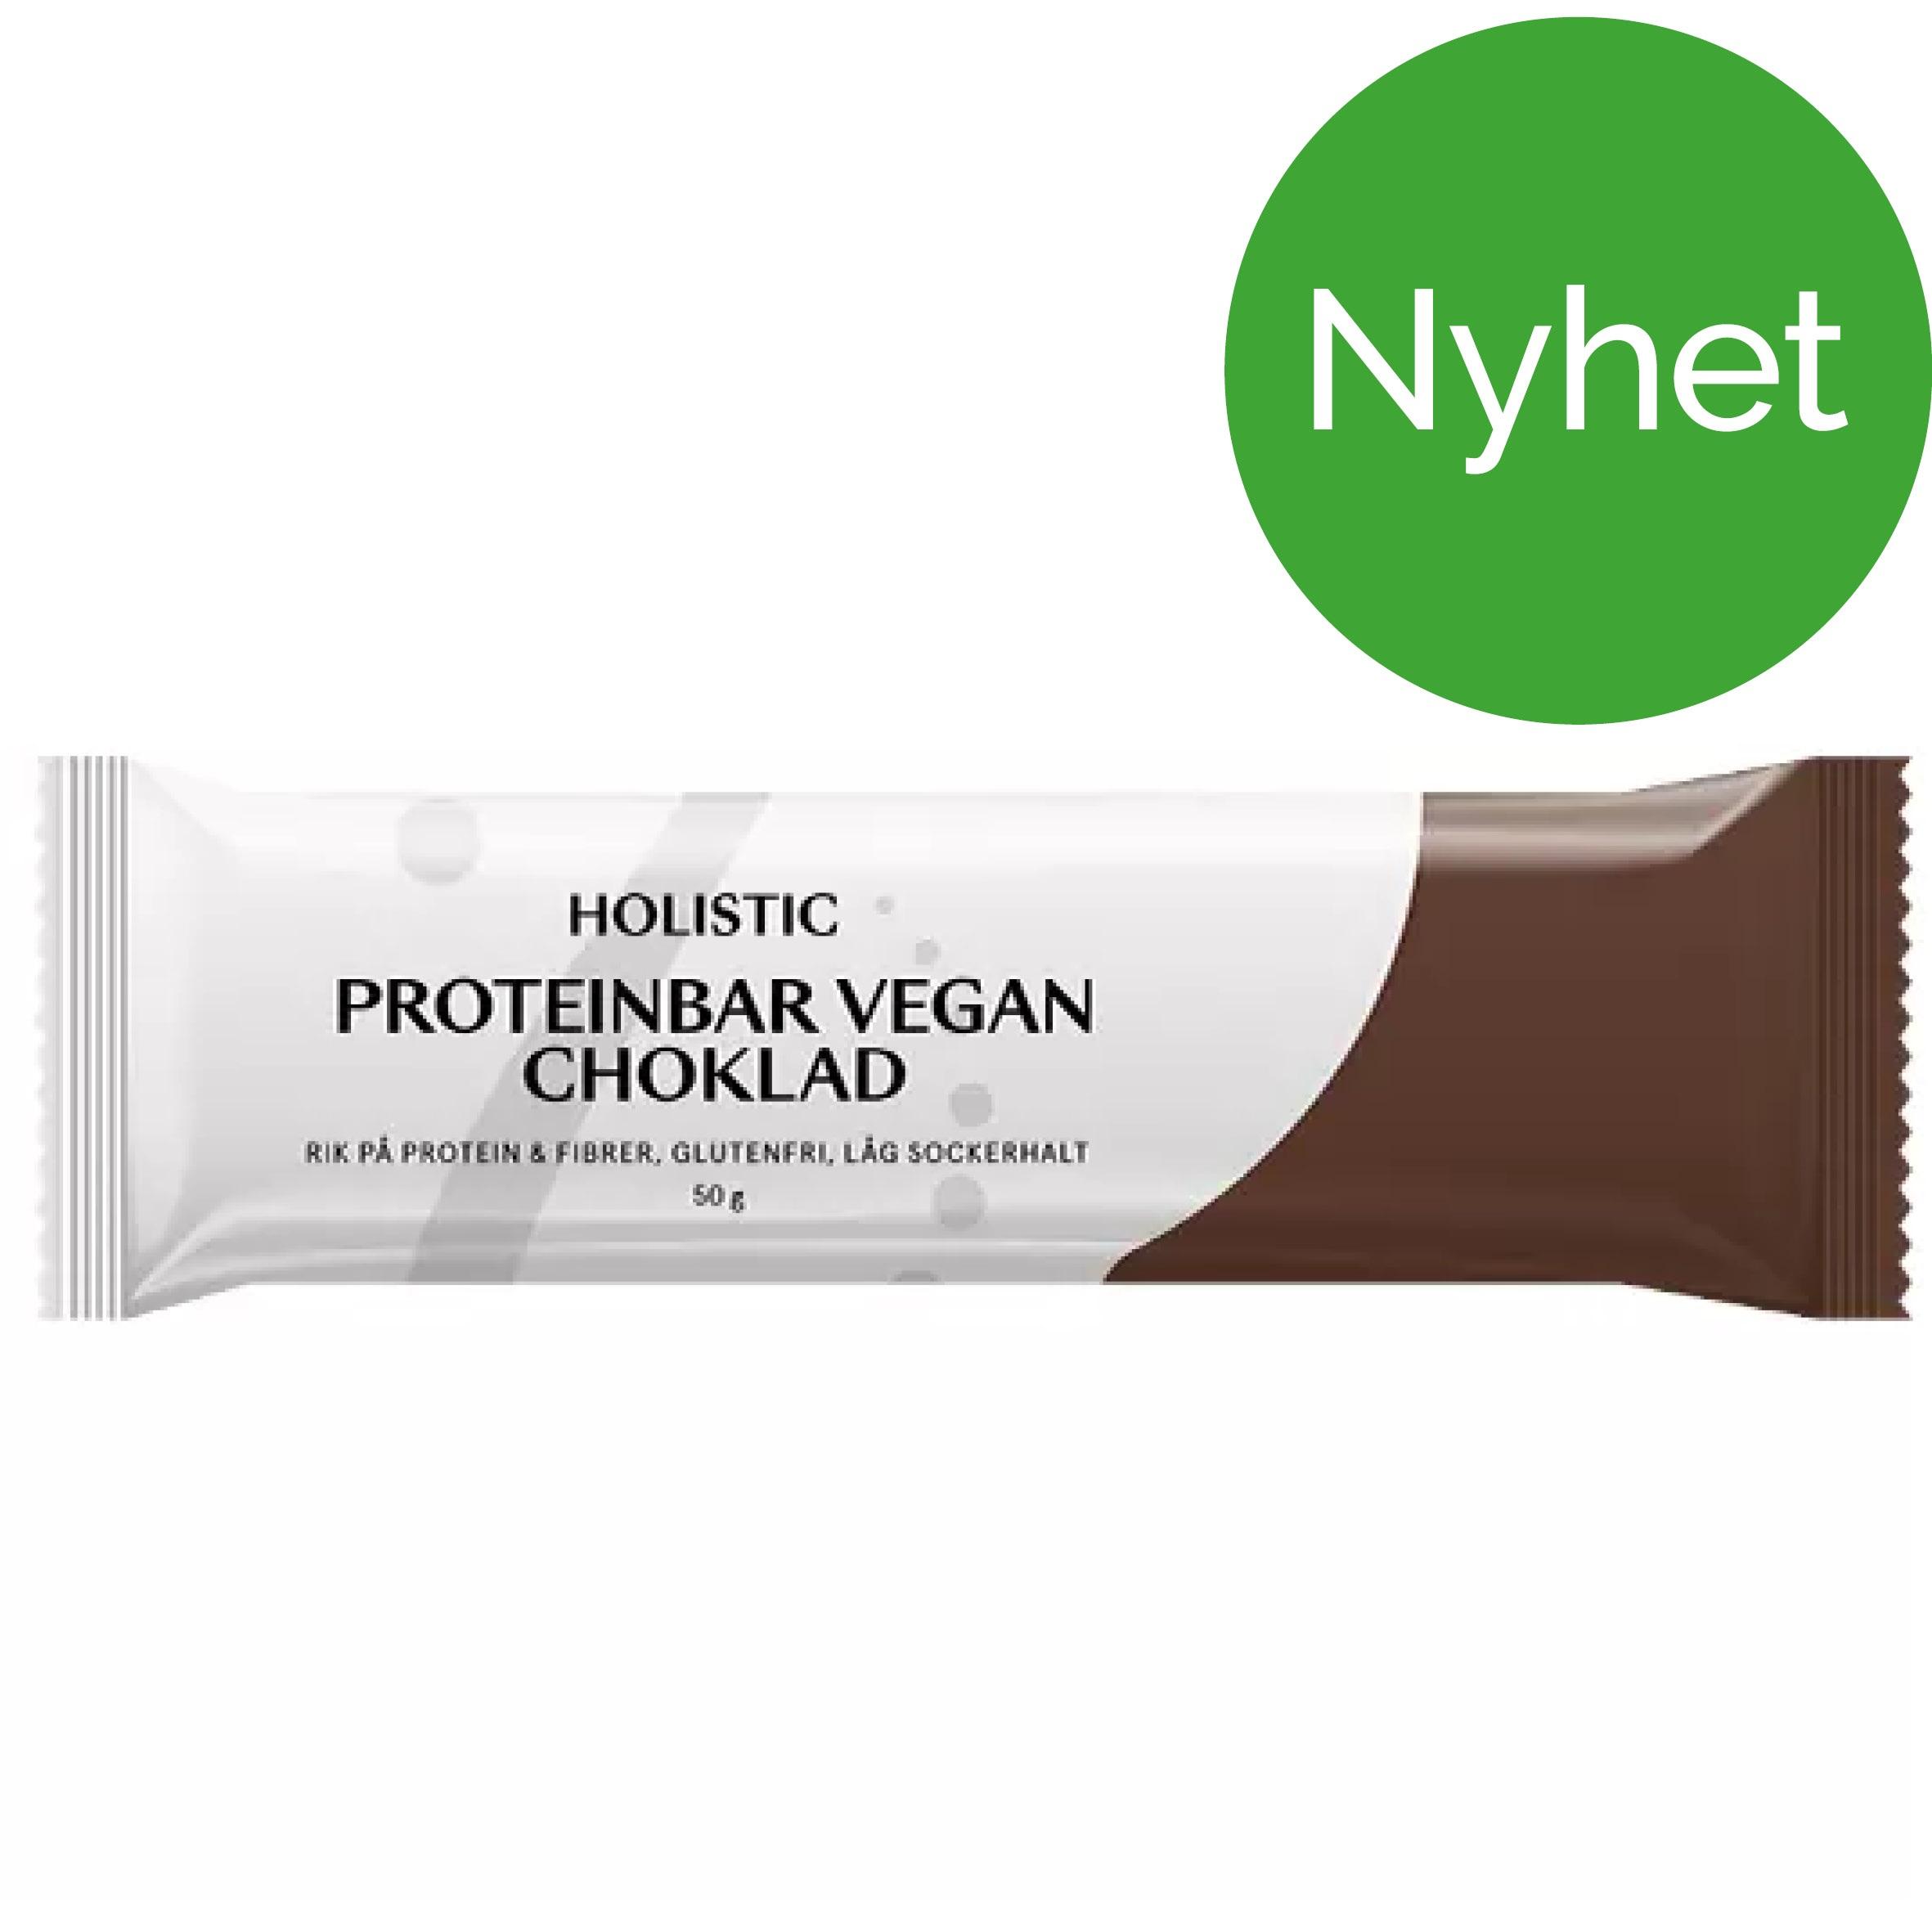 Proteinbar-choklad-20060-nyhet